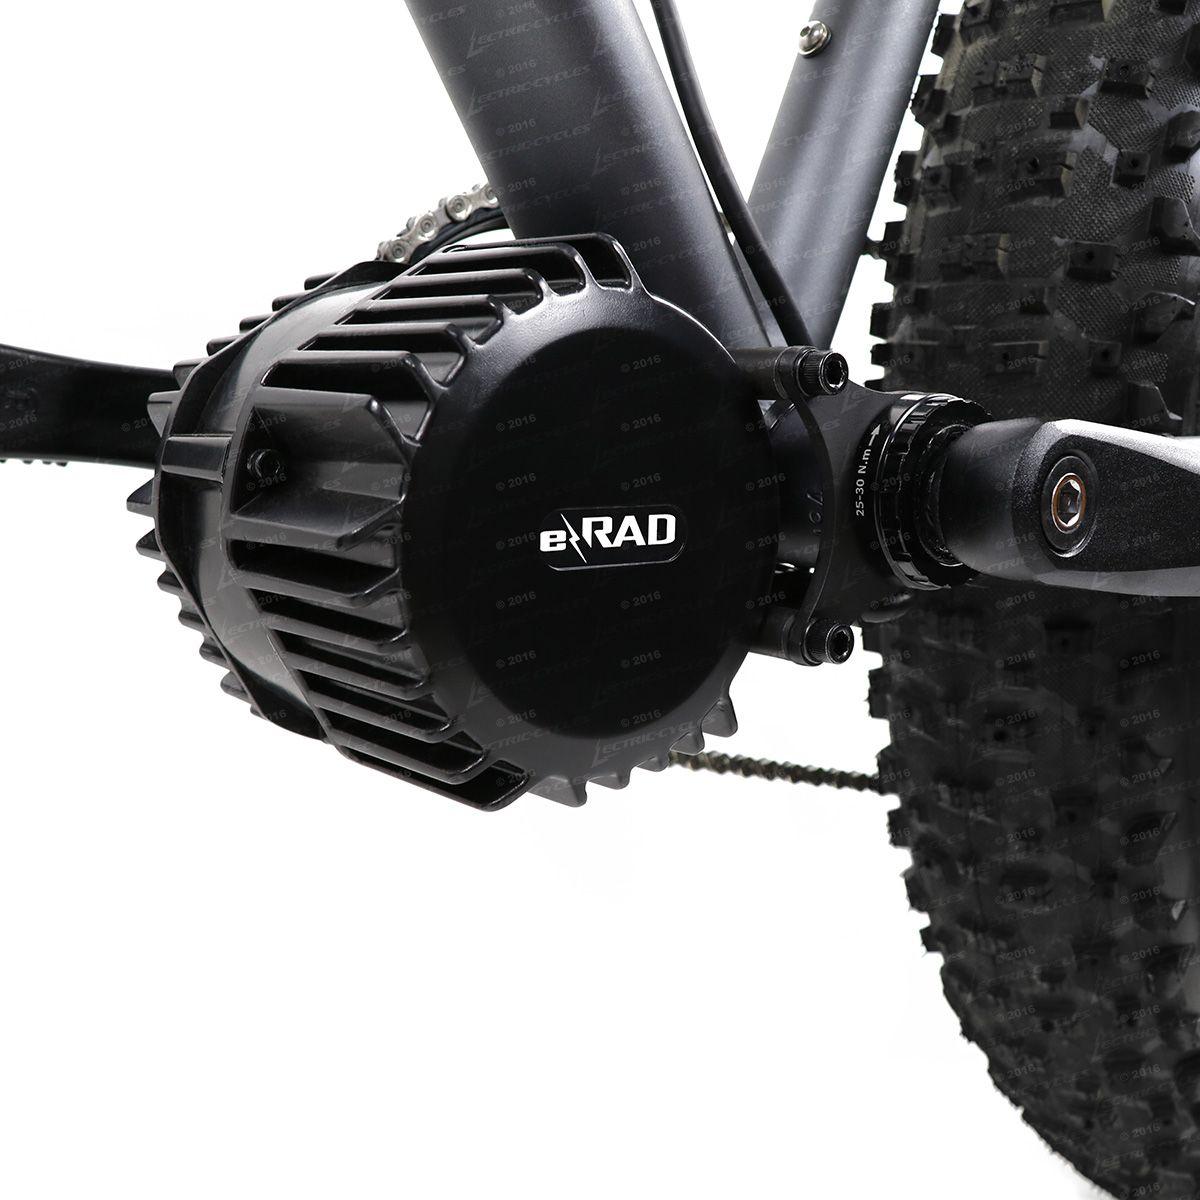 E Rad Hd 1000 Closeup Web Bike Build Pinterest Bike Kit And